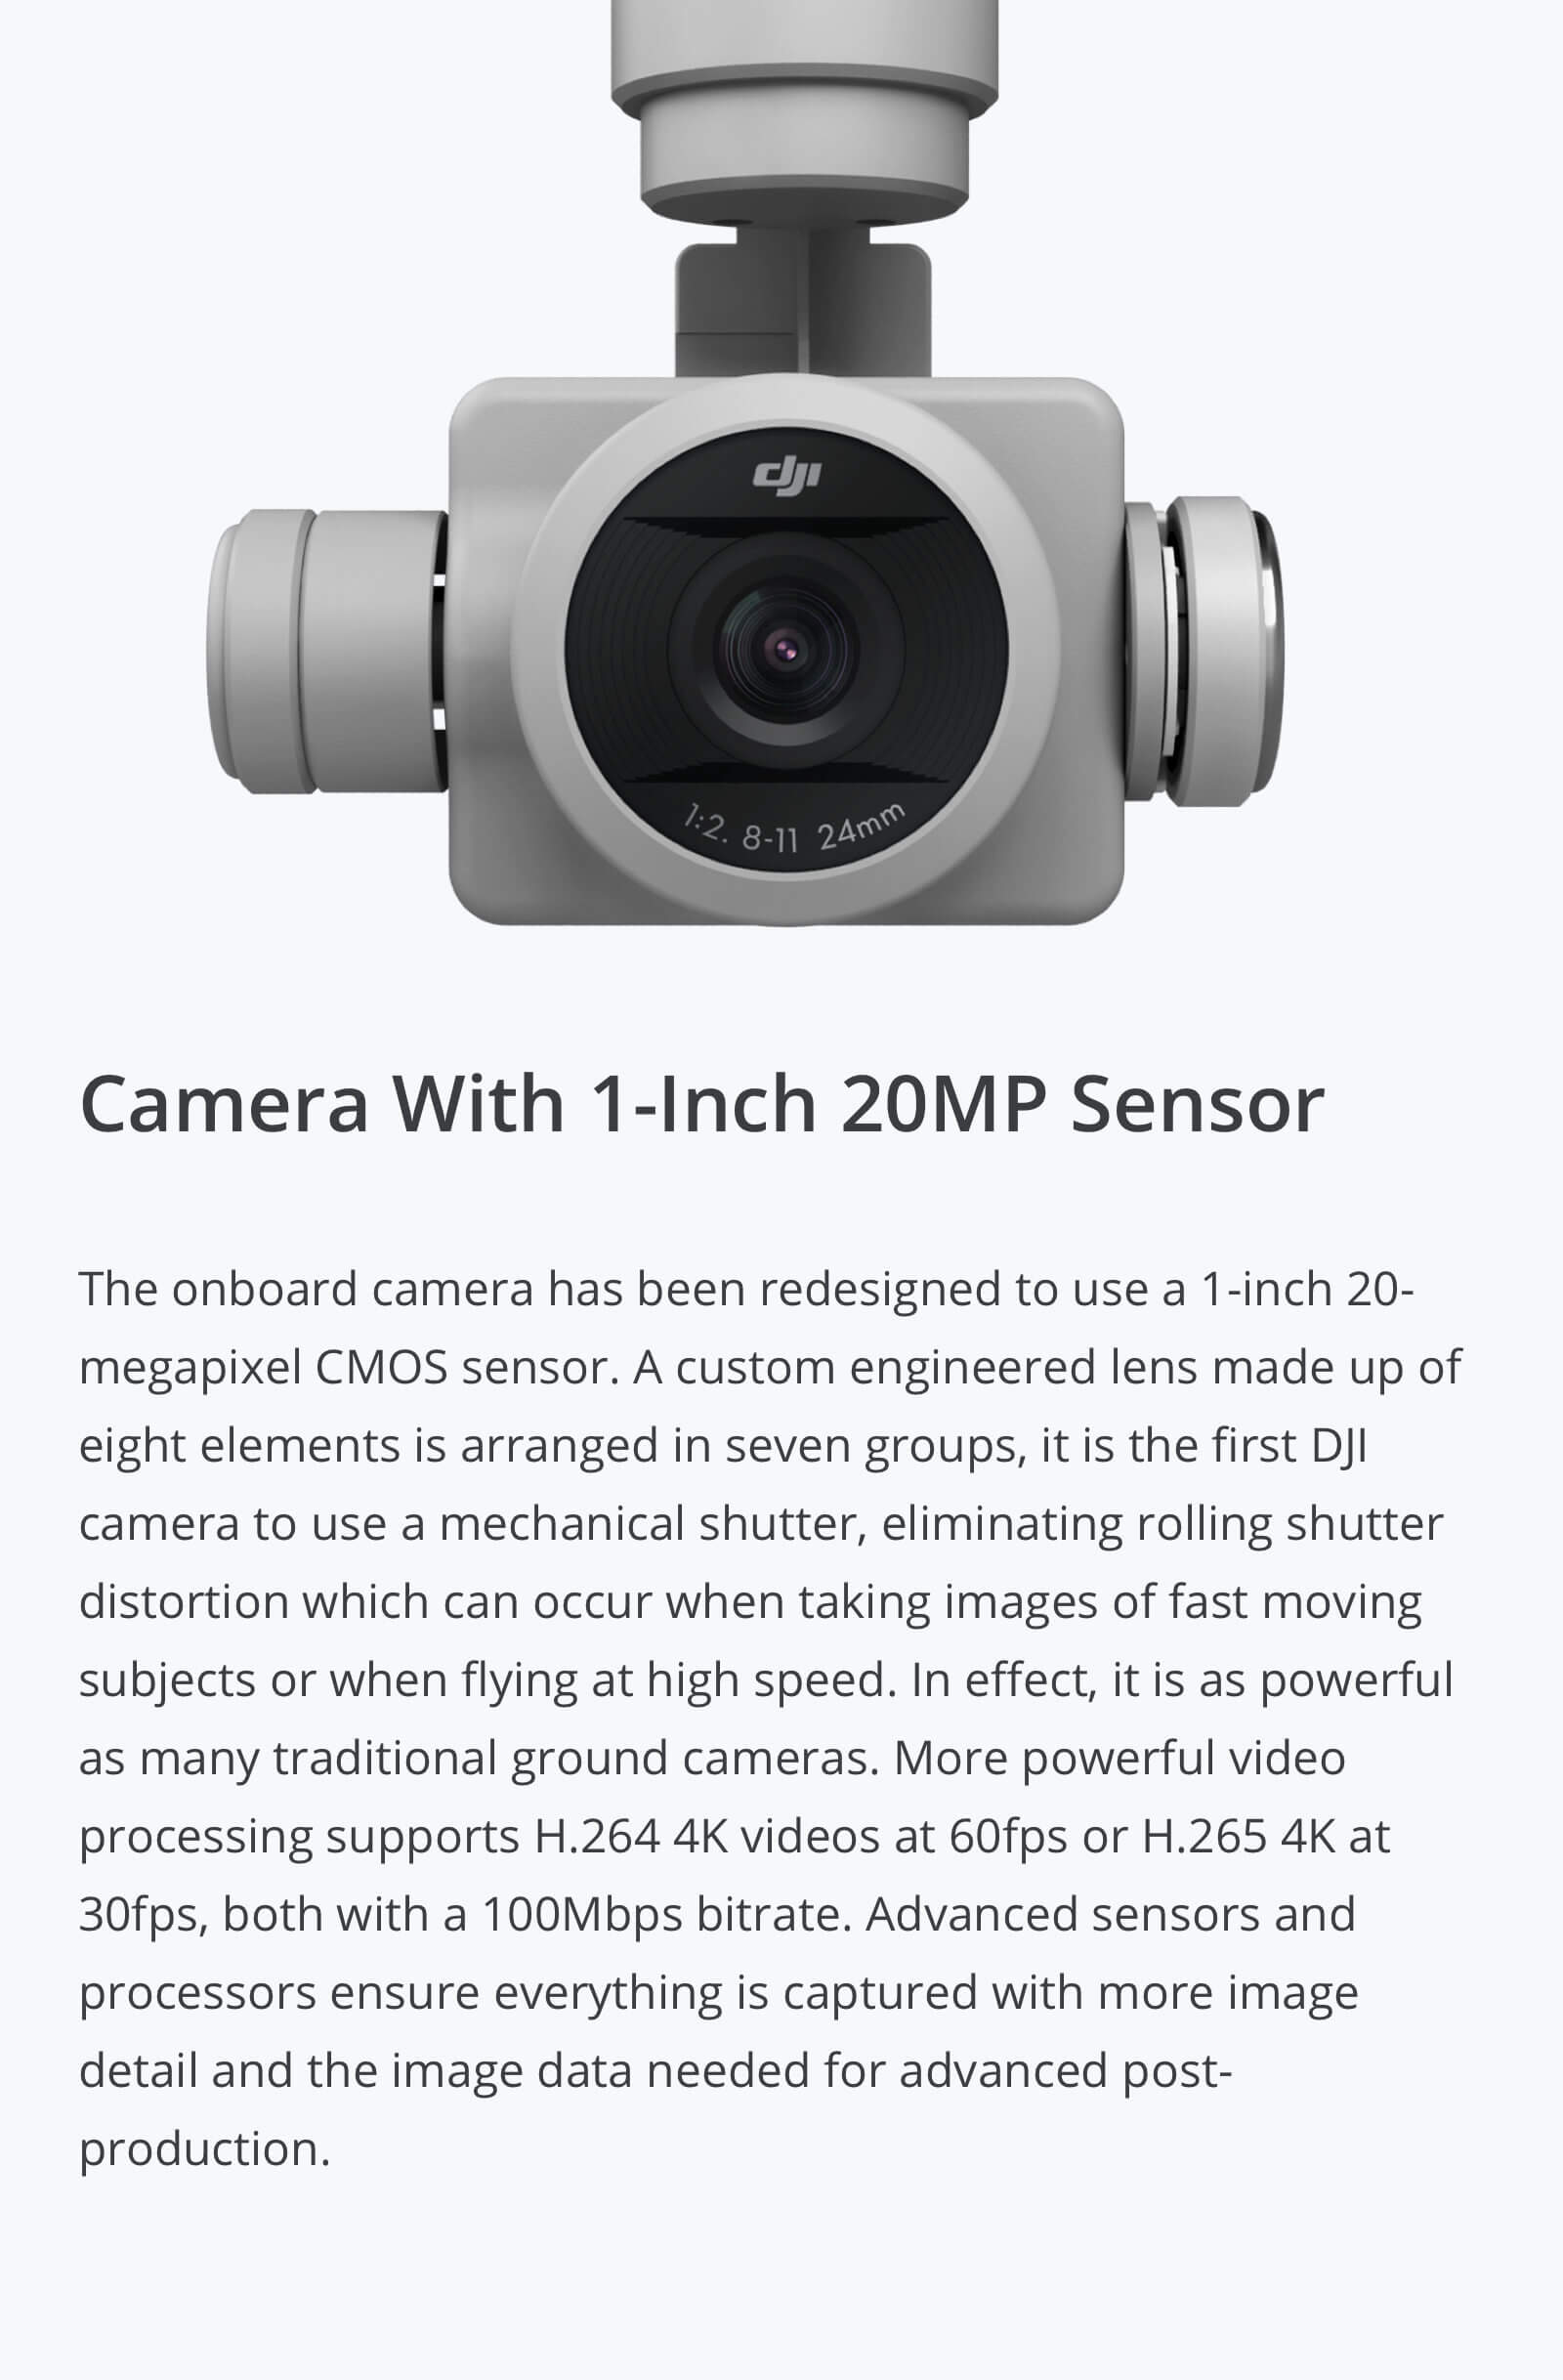 DJI Phantom 4 Pro V2.0 Camera